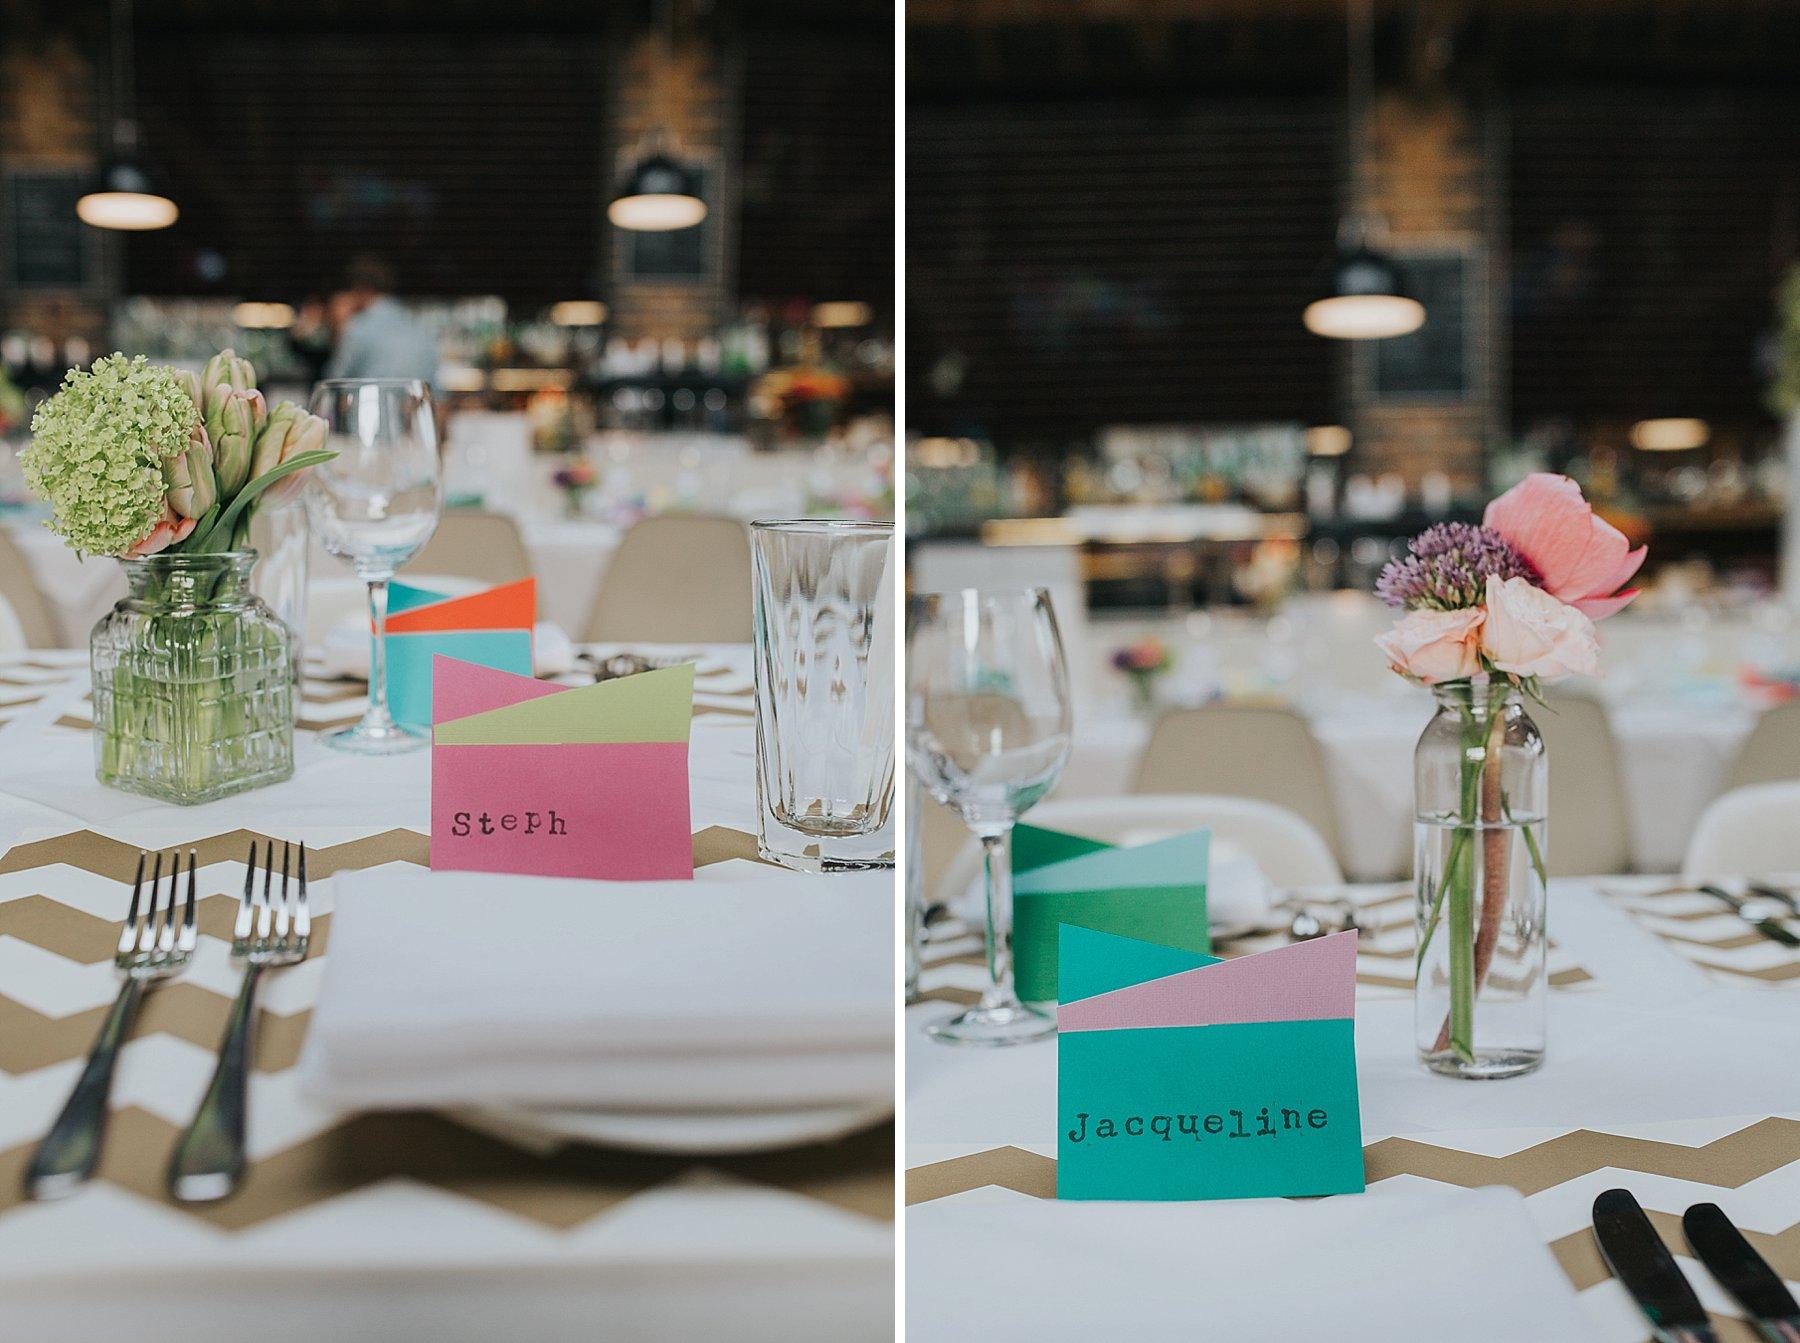 29-St Chads Place wedding gold chevron table mulit colour geometric place names.jpg